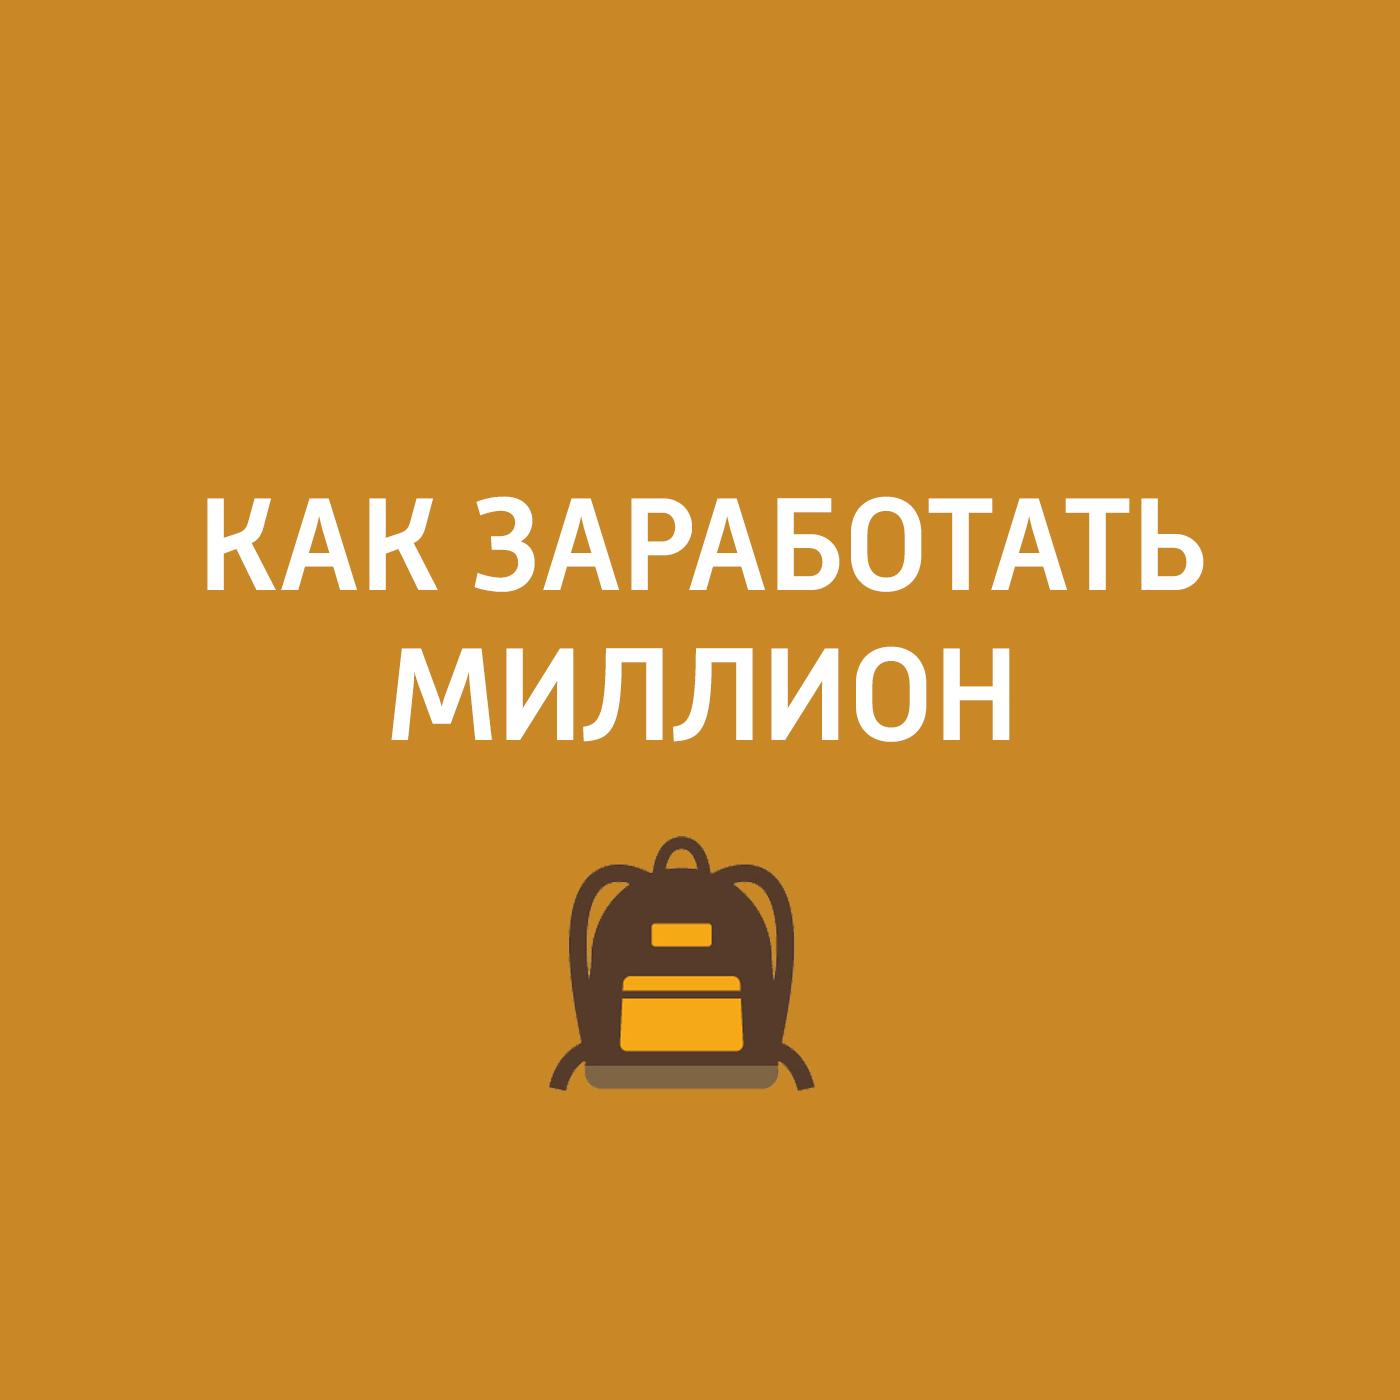 Творческий коллектив шоу «Сергей Стиллавин и его друзья» Ziq & Yoni